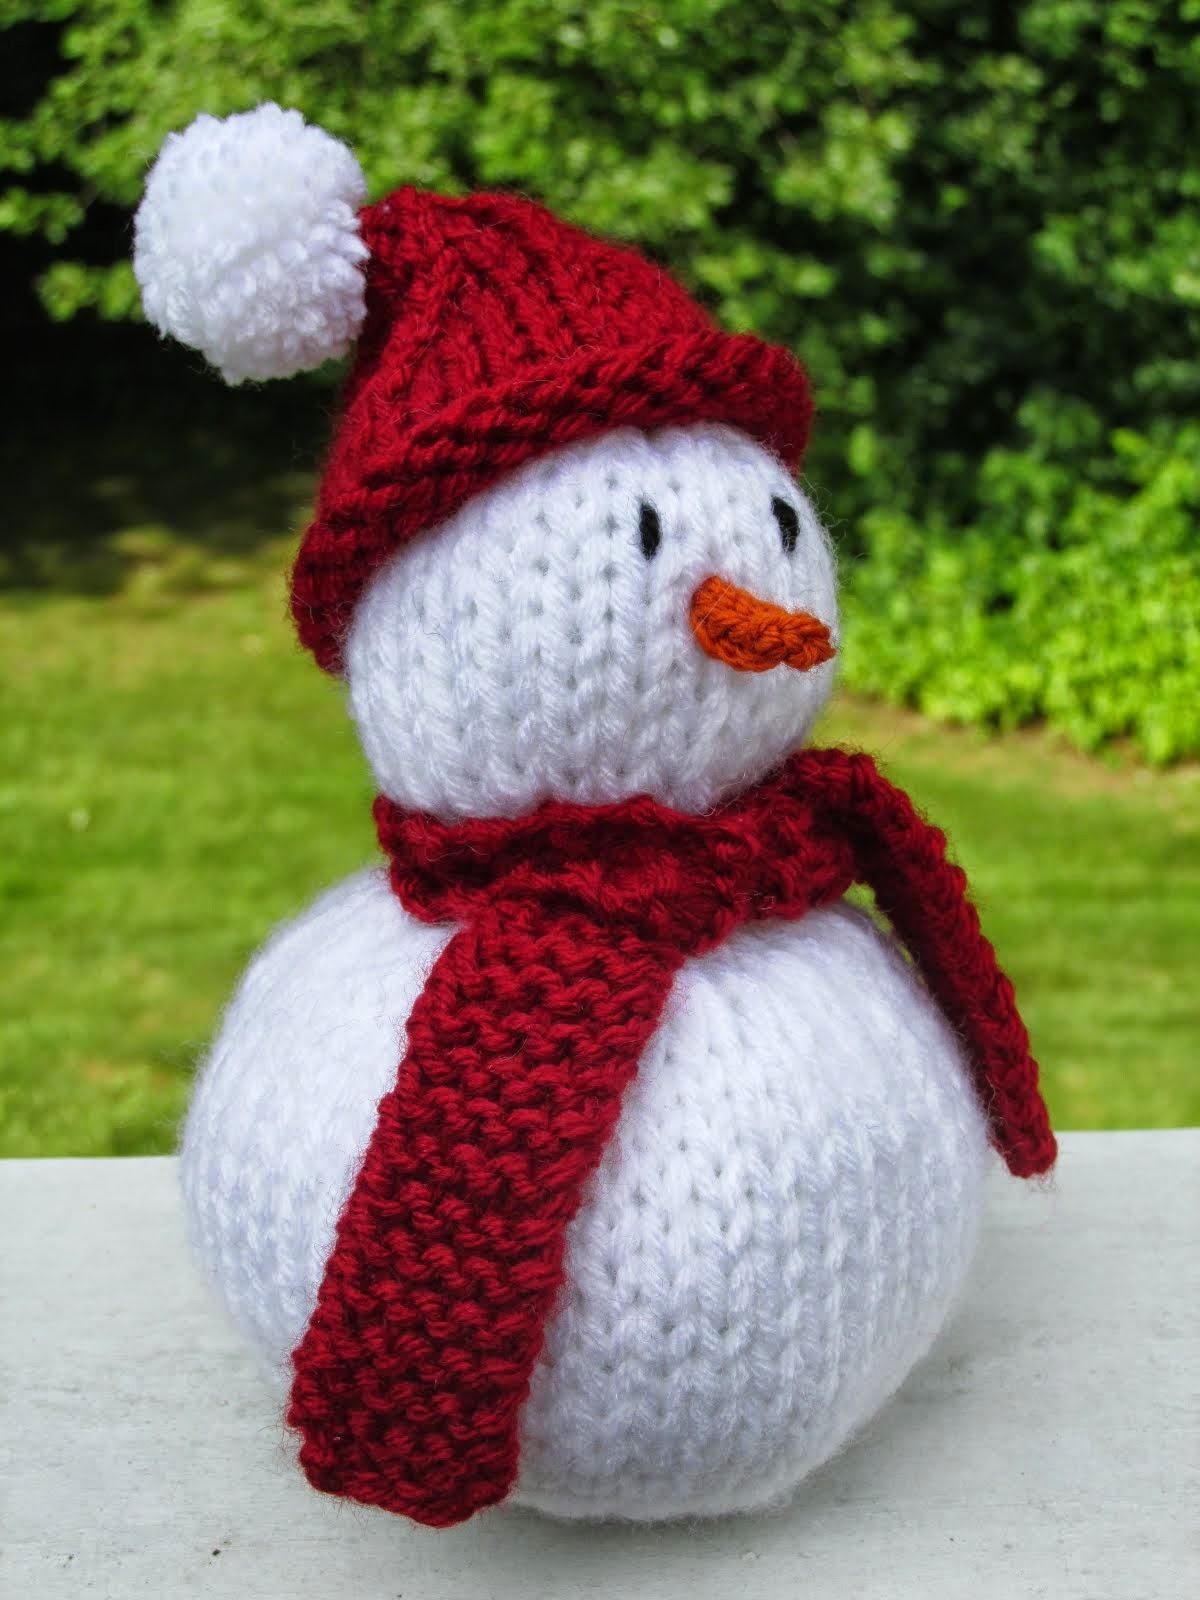 Noseman The Snowman